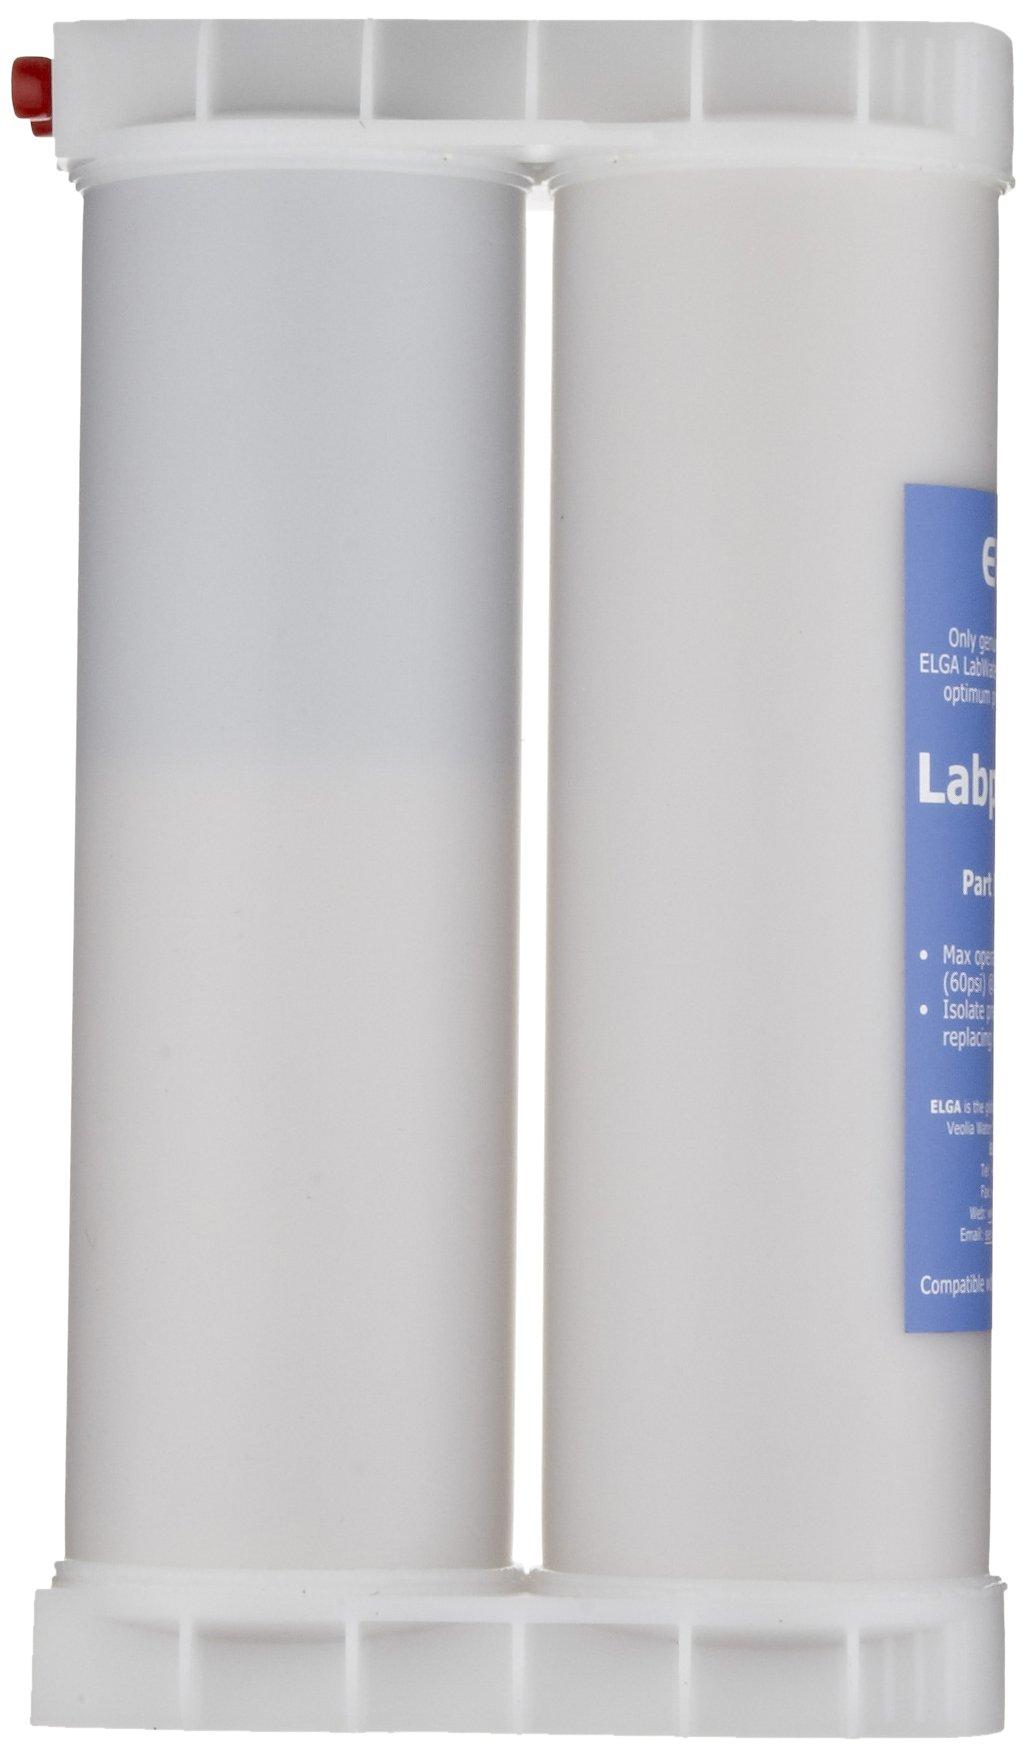 Elga LC184 Labpure S3 Purification Cartridge Low Ionic, For Purelab Ultra by Elga